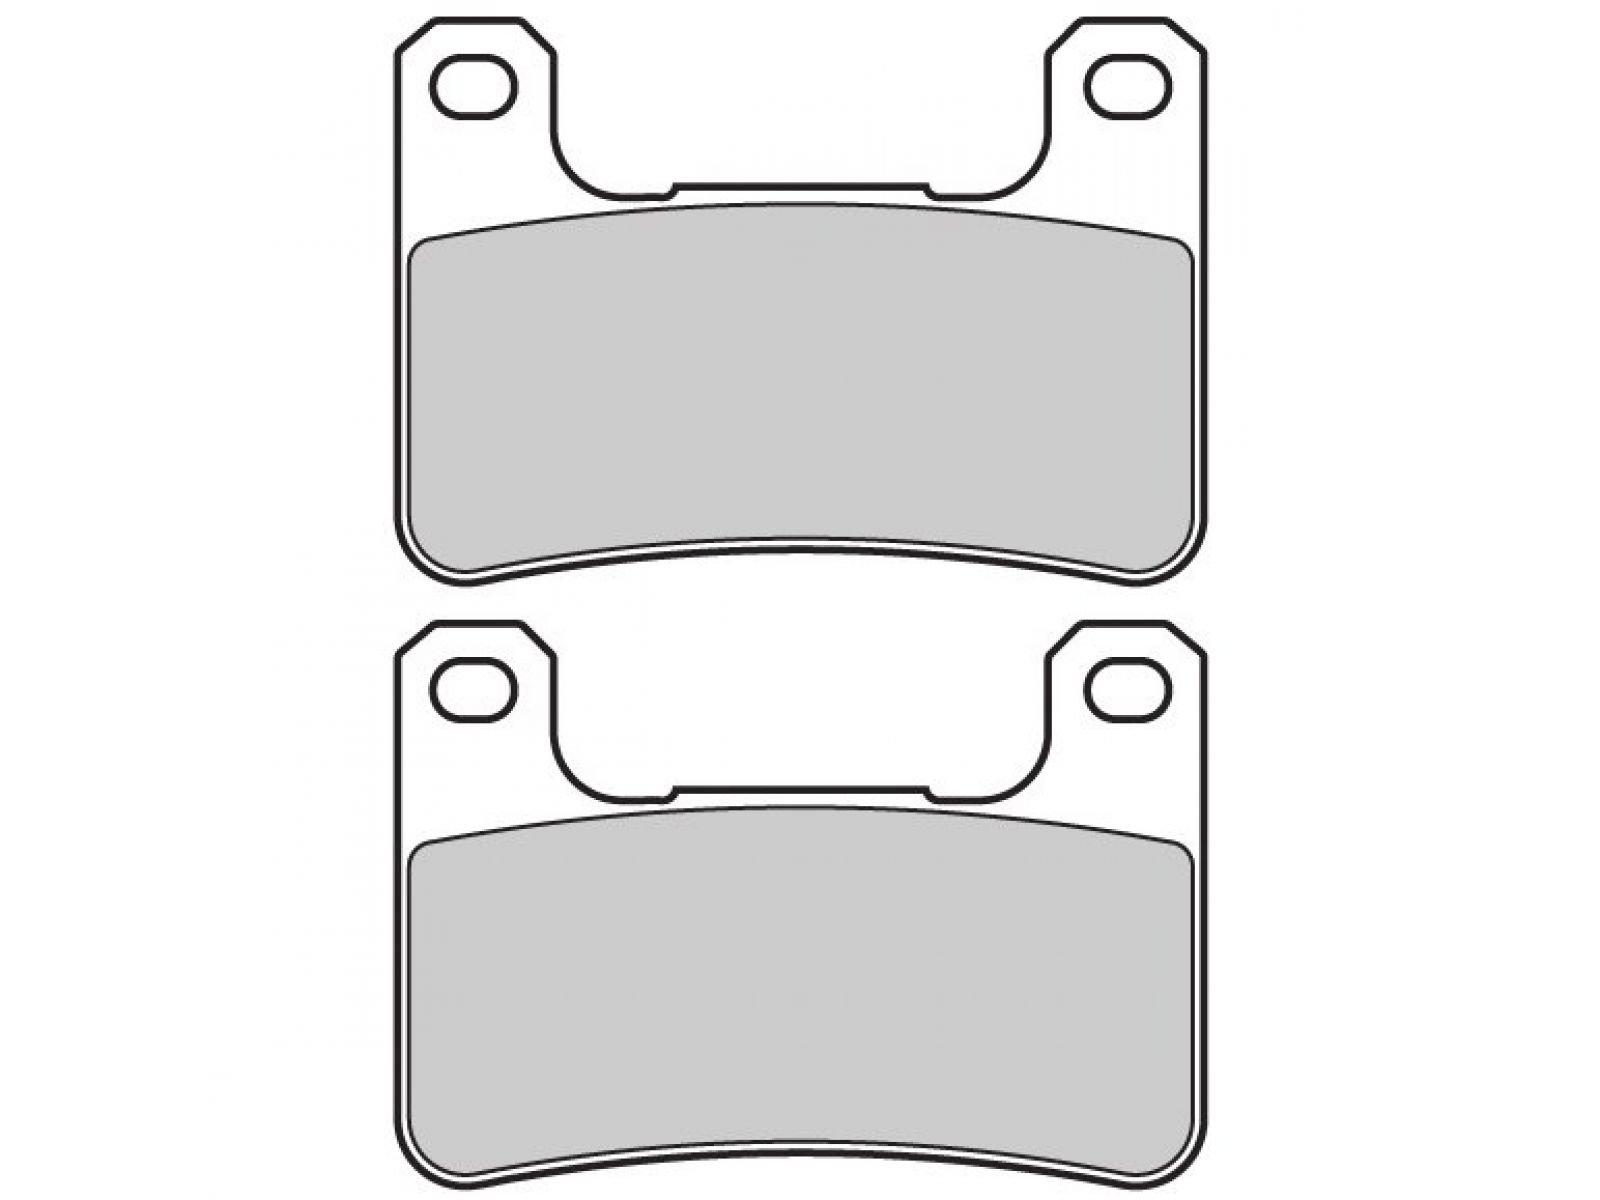 Колодки тормозные для Kawasaki Z1000 12-14, Z1000SX 11-13